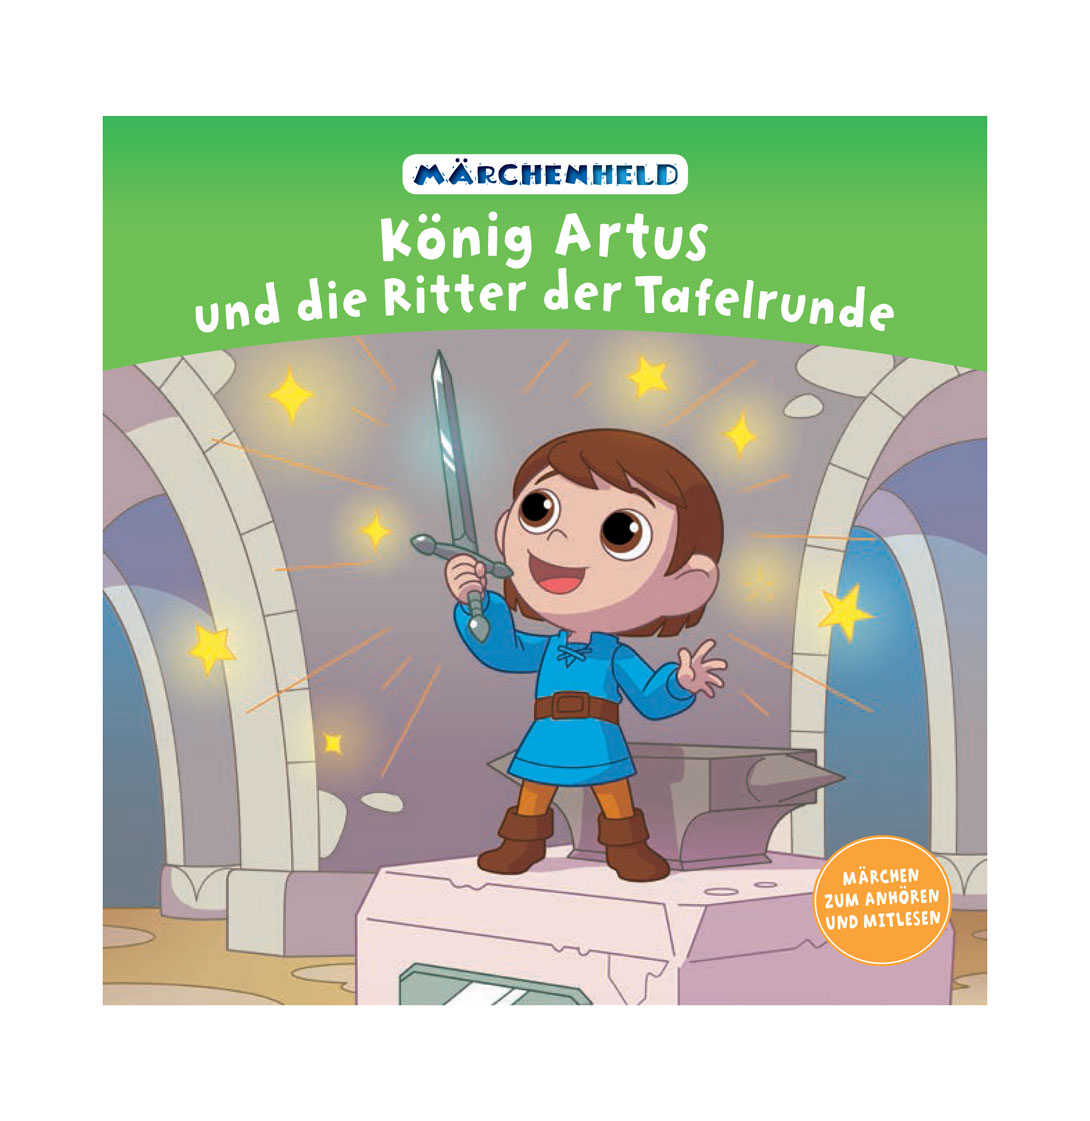 Märchenheld – Ausgabe 51